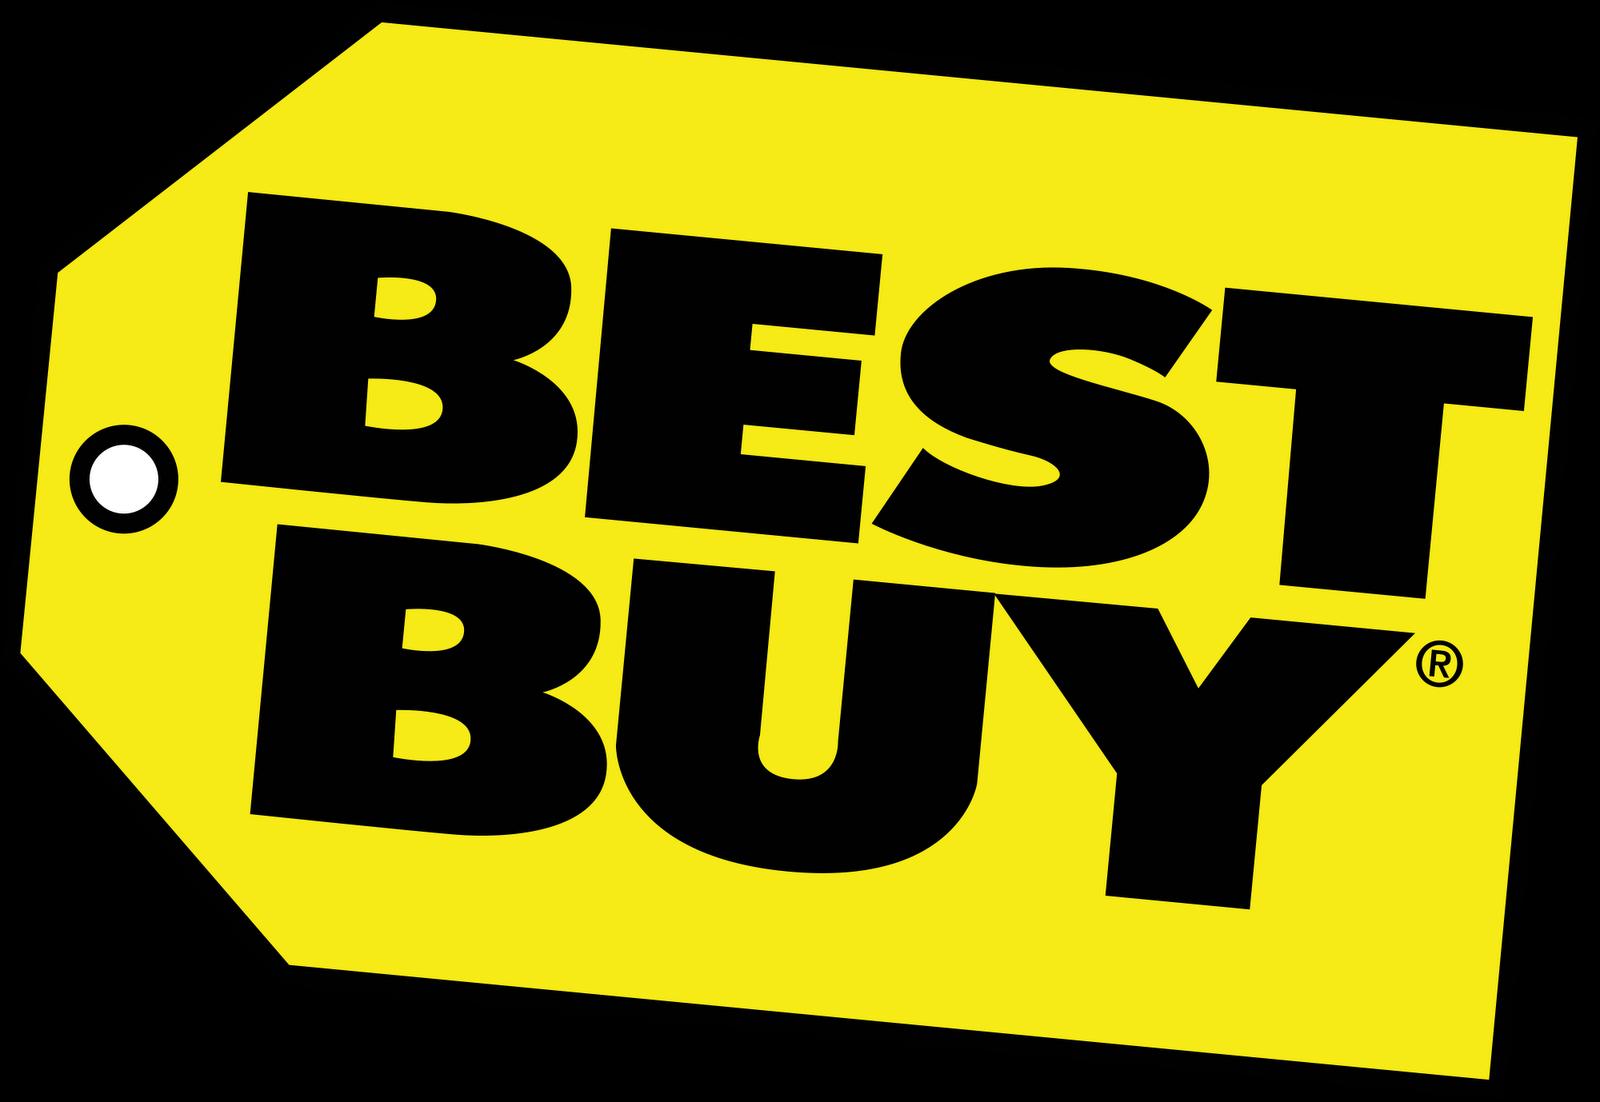 Best_buy_logo.png